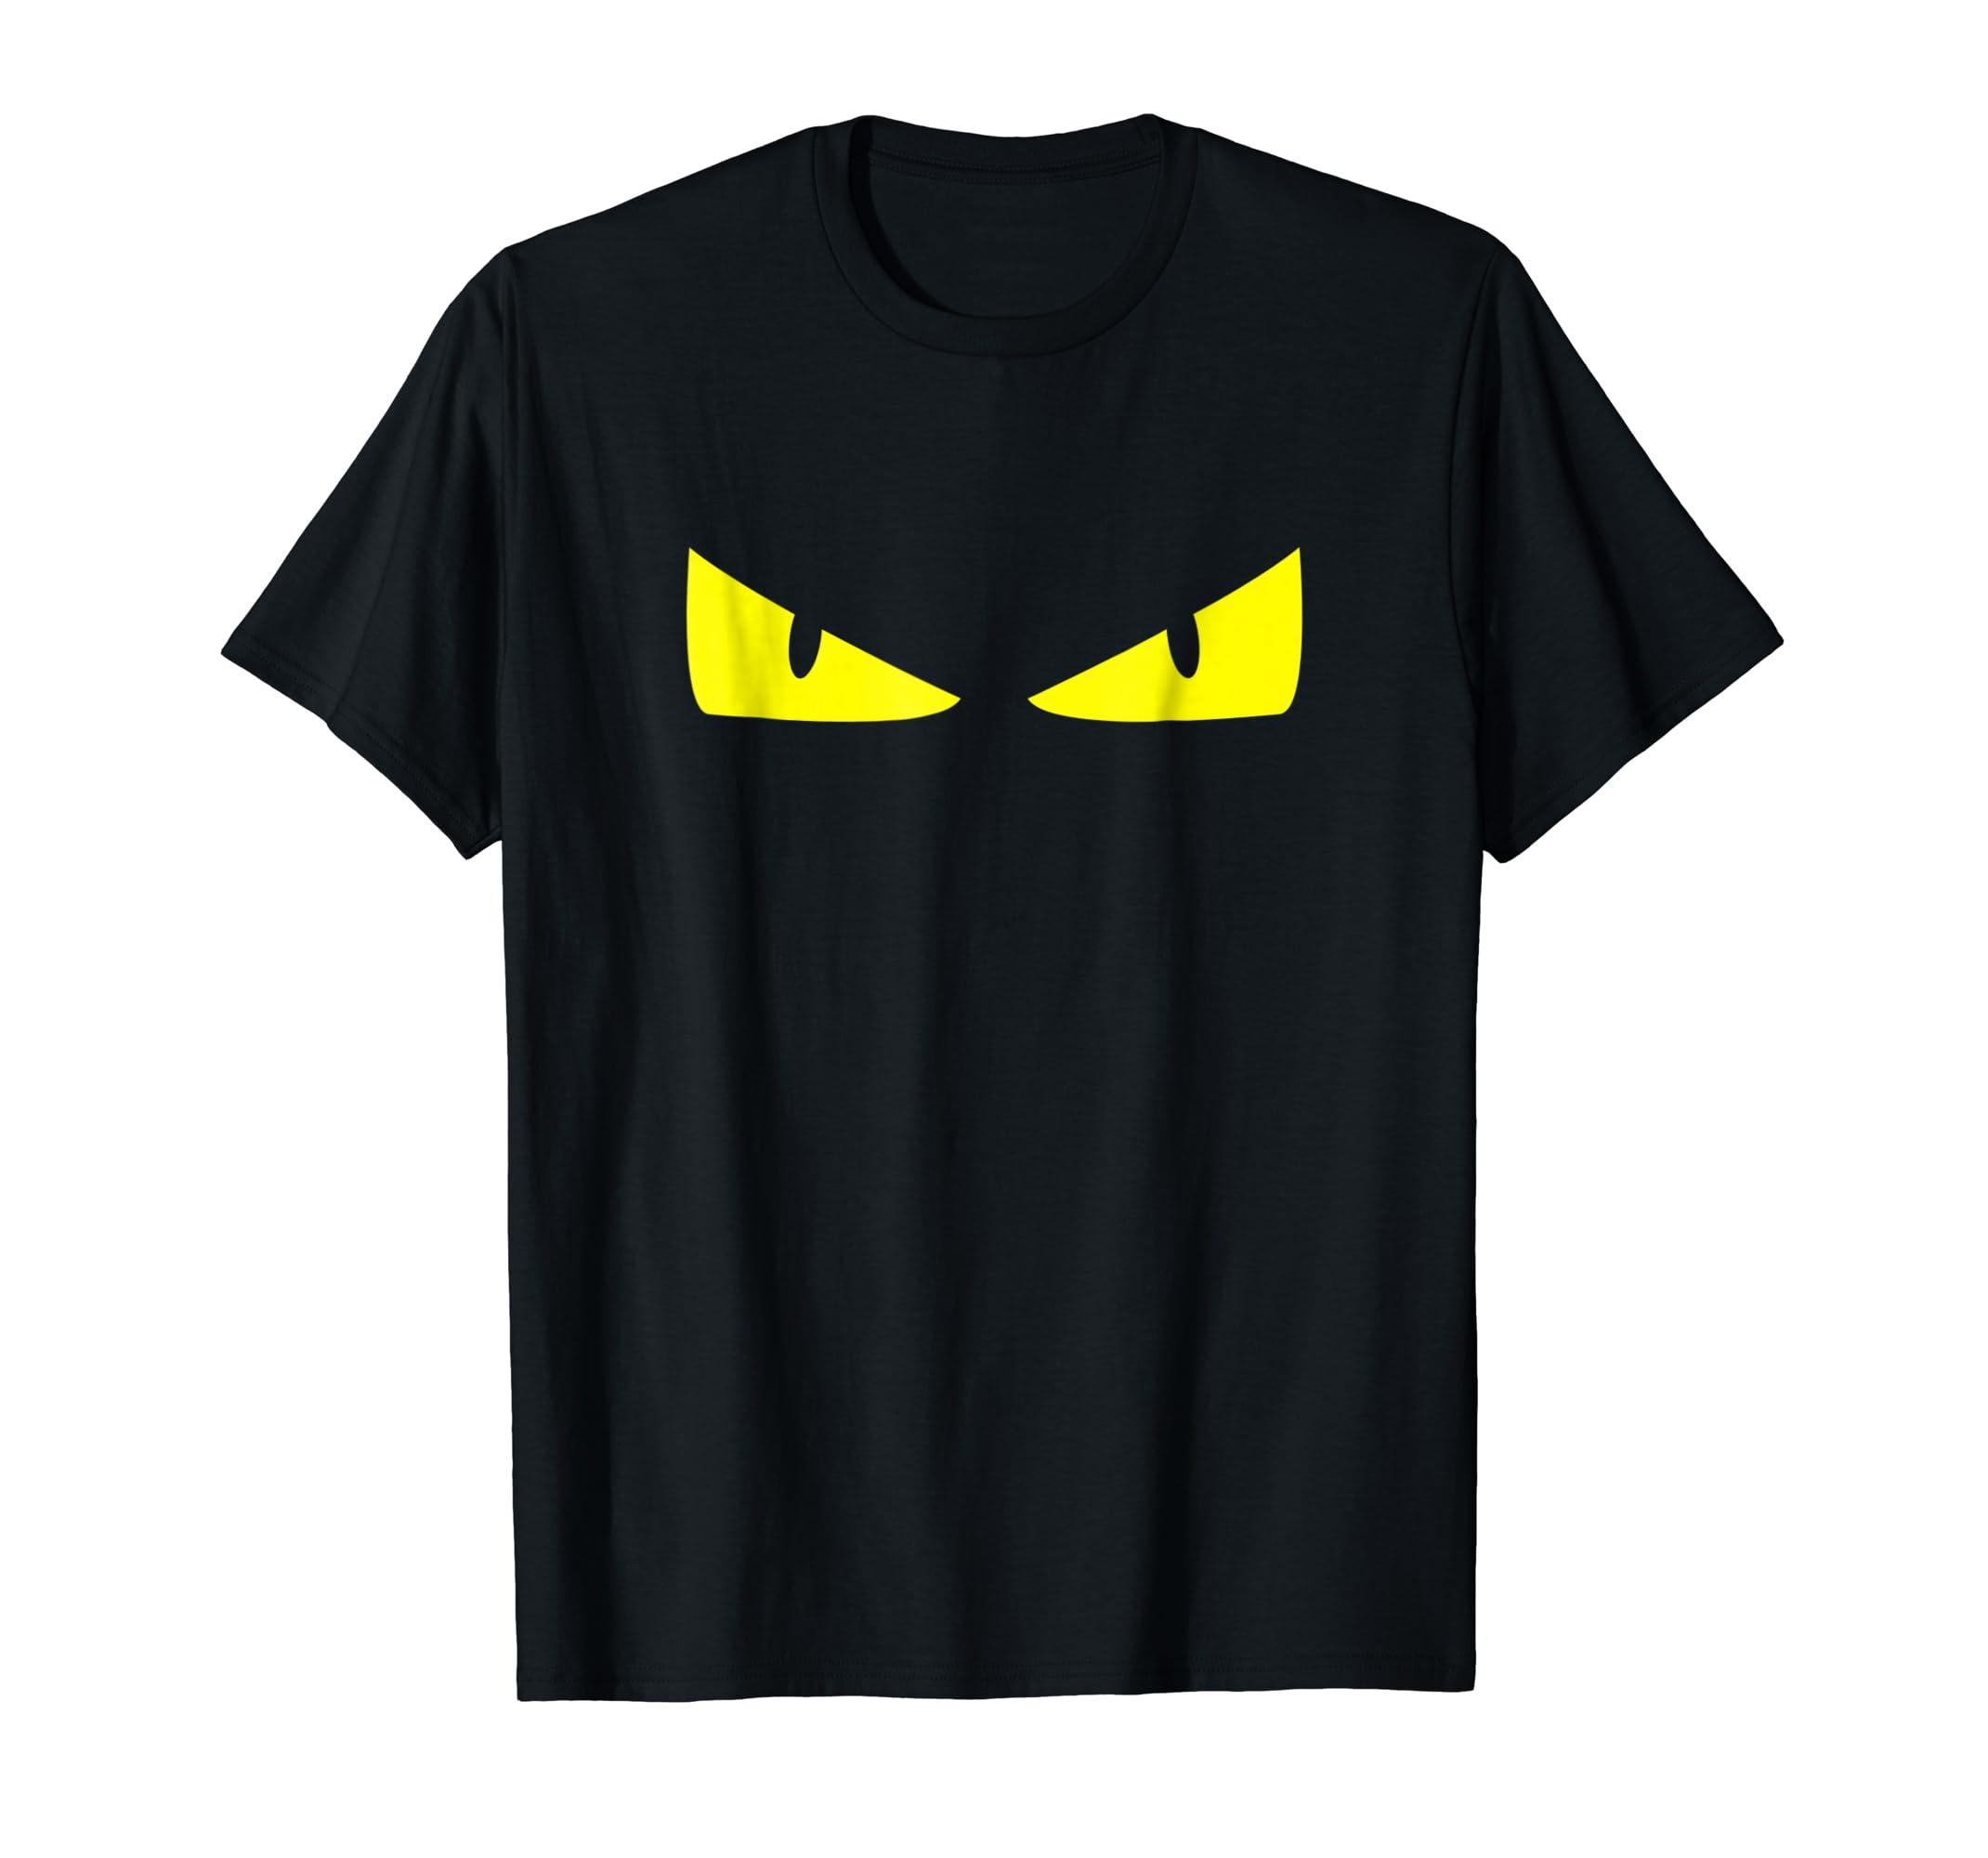 ee1ad8991df Amazon.com  Cool Monster Devil s Eye Shirt For Men Women kids Halloween   Clothing